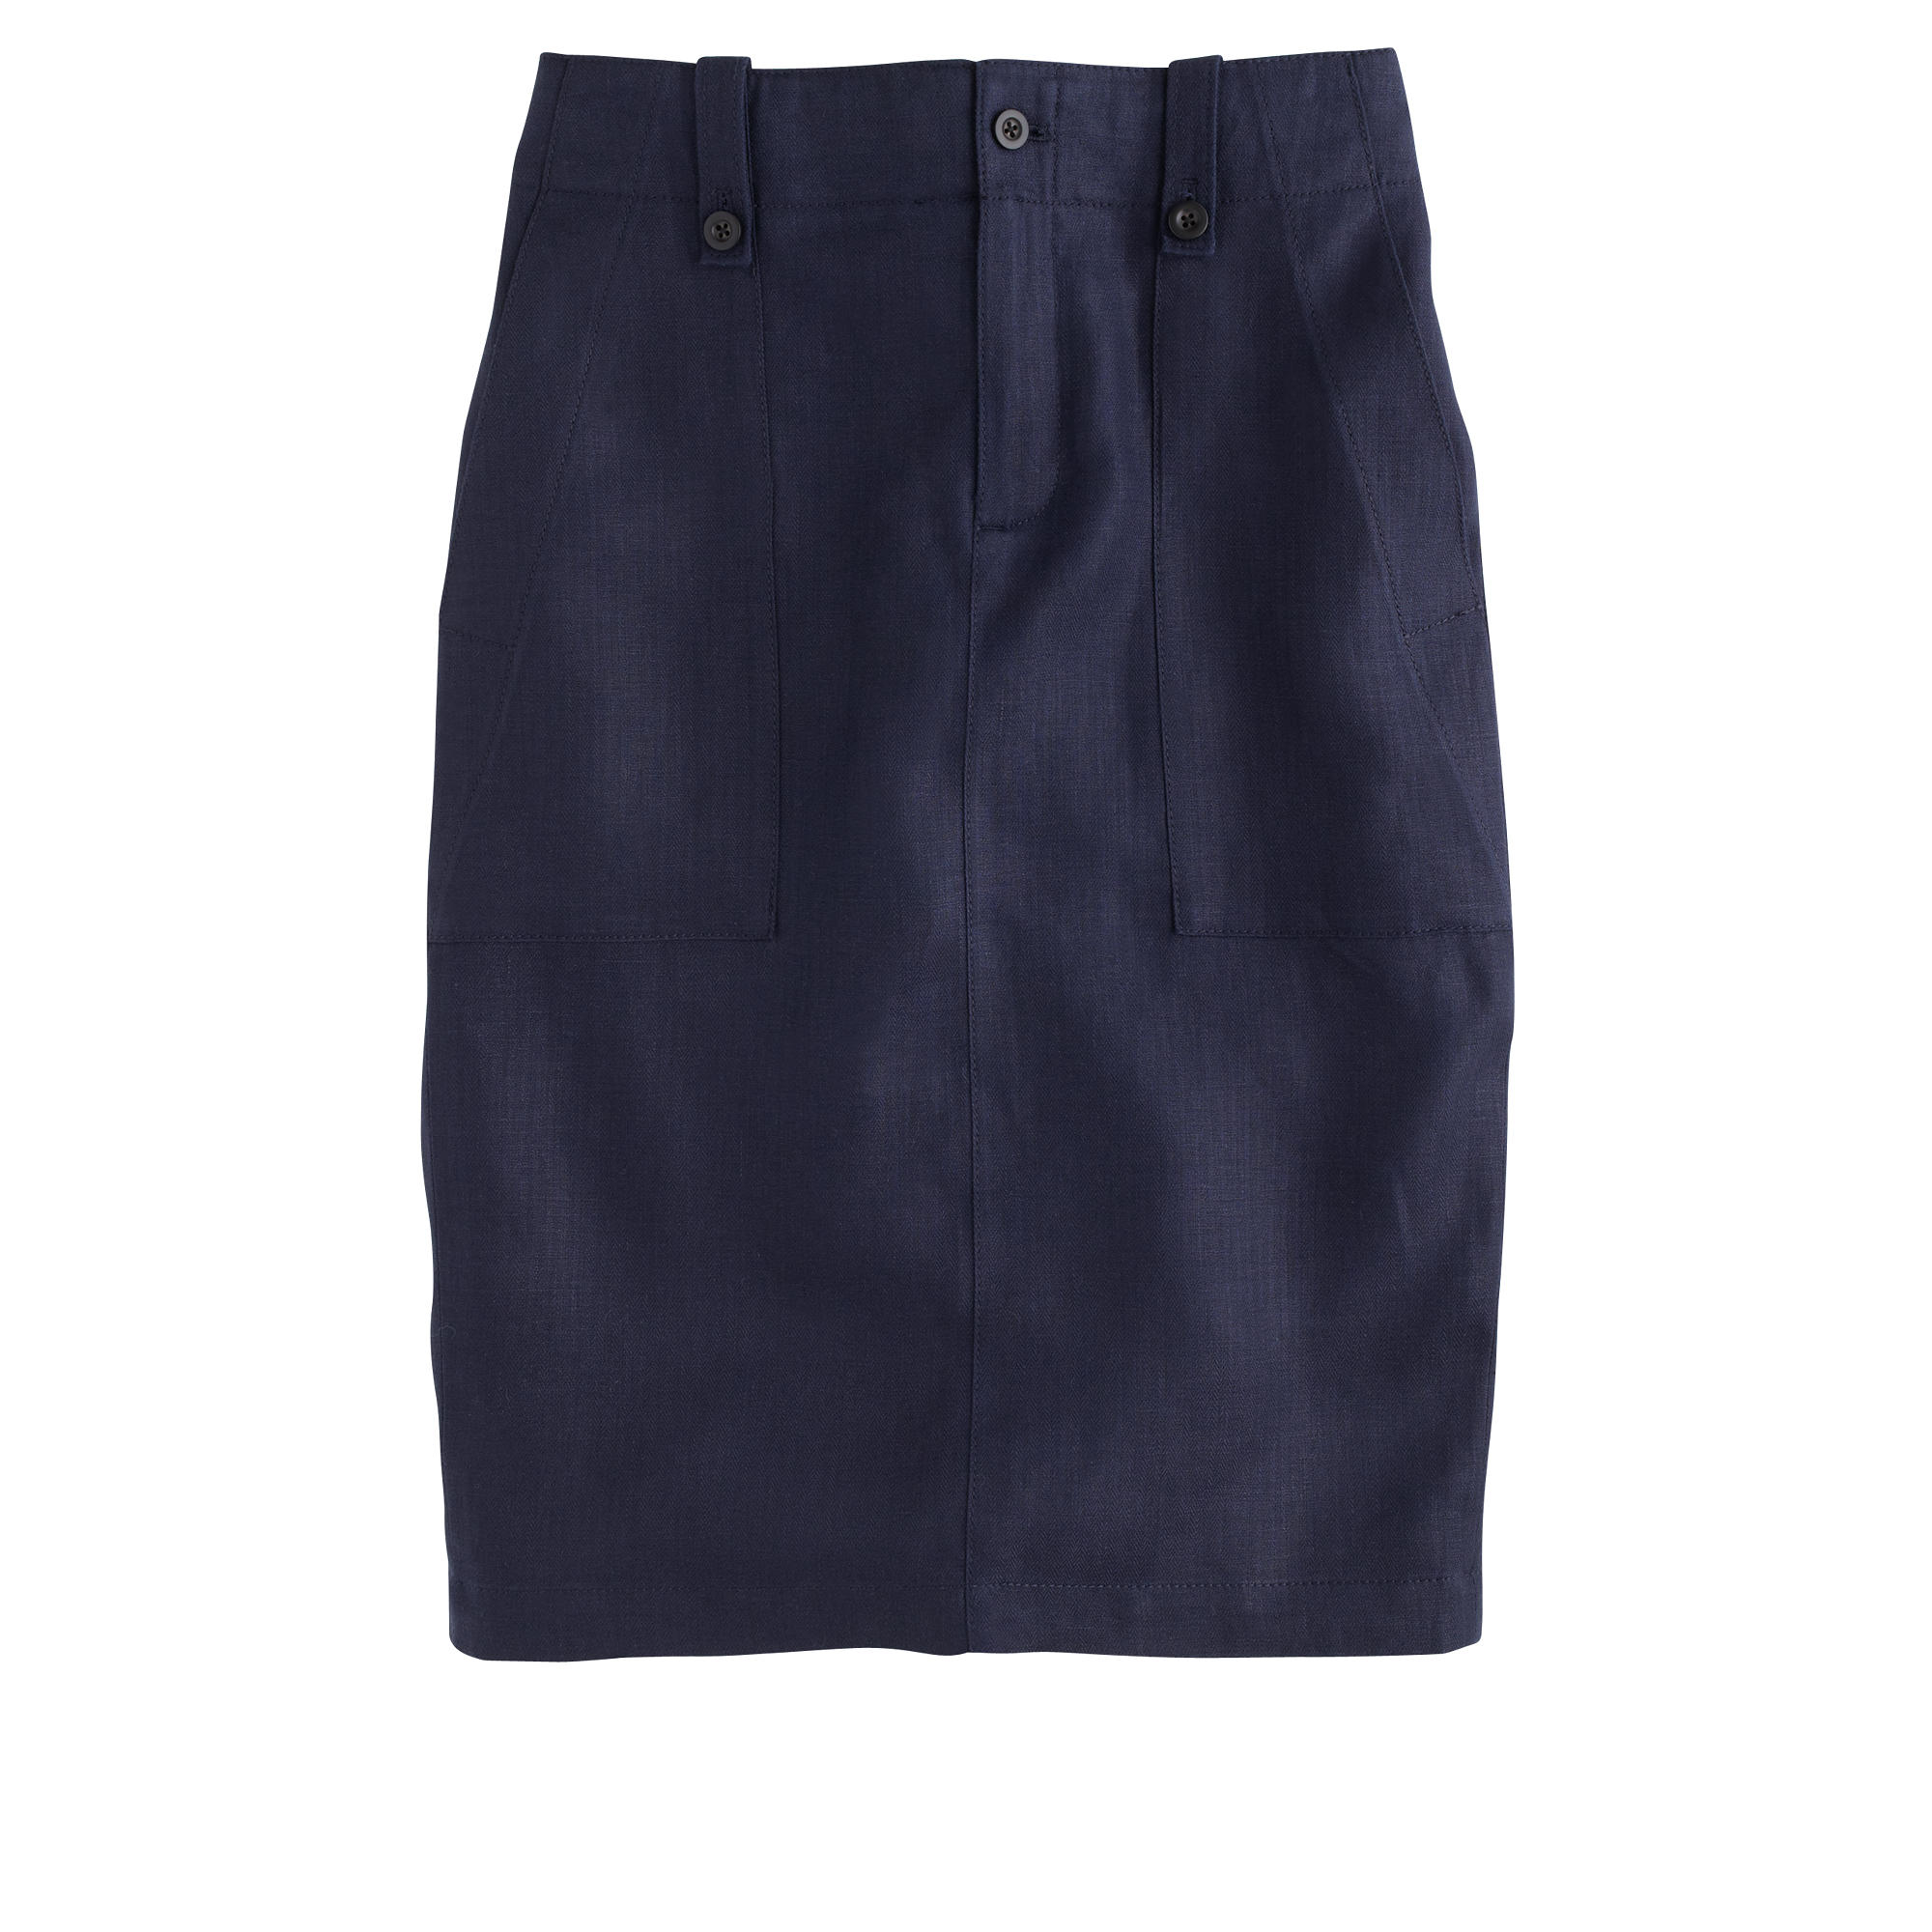 j crew linen cargo pencil skirt in blue lyst